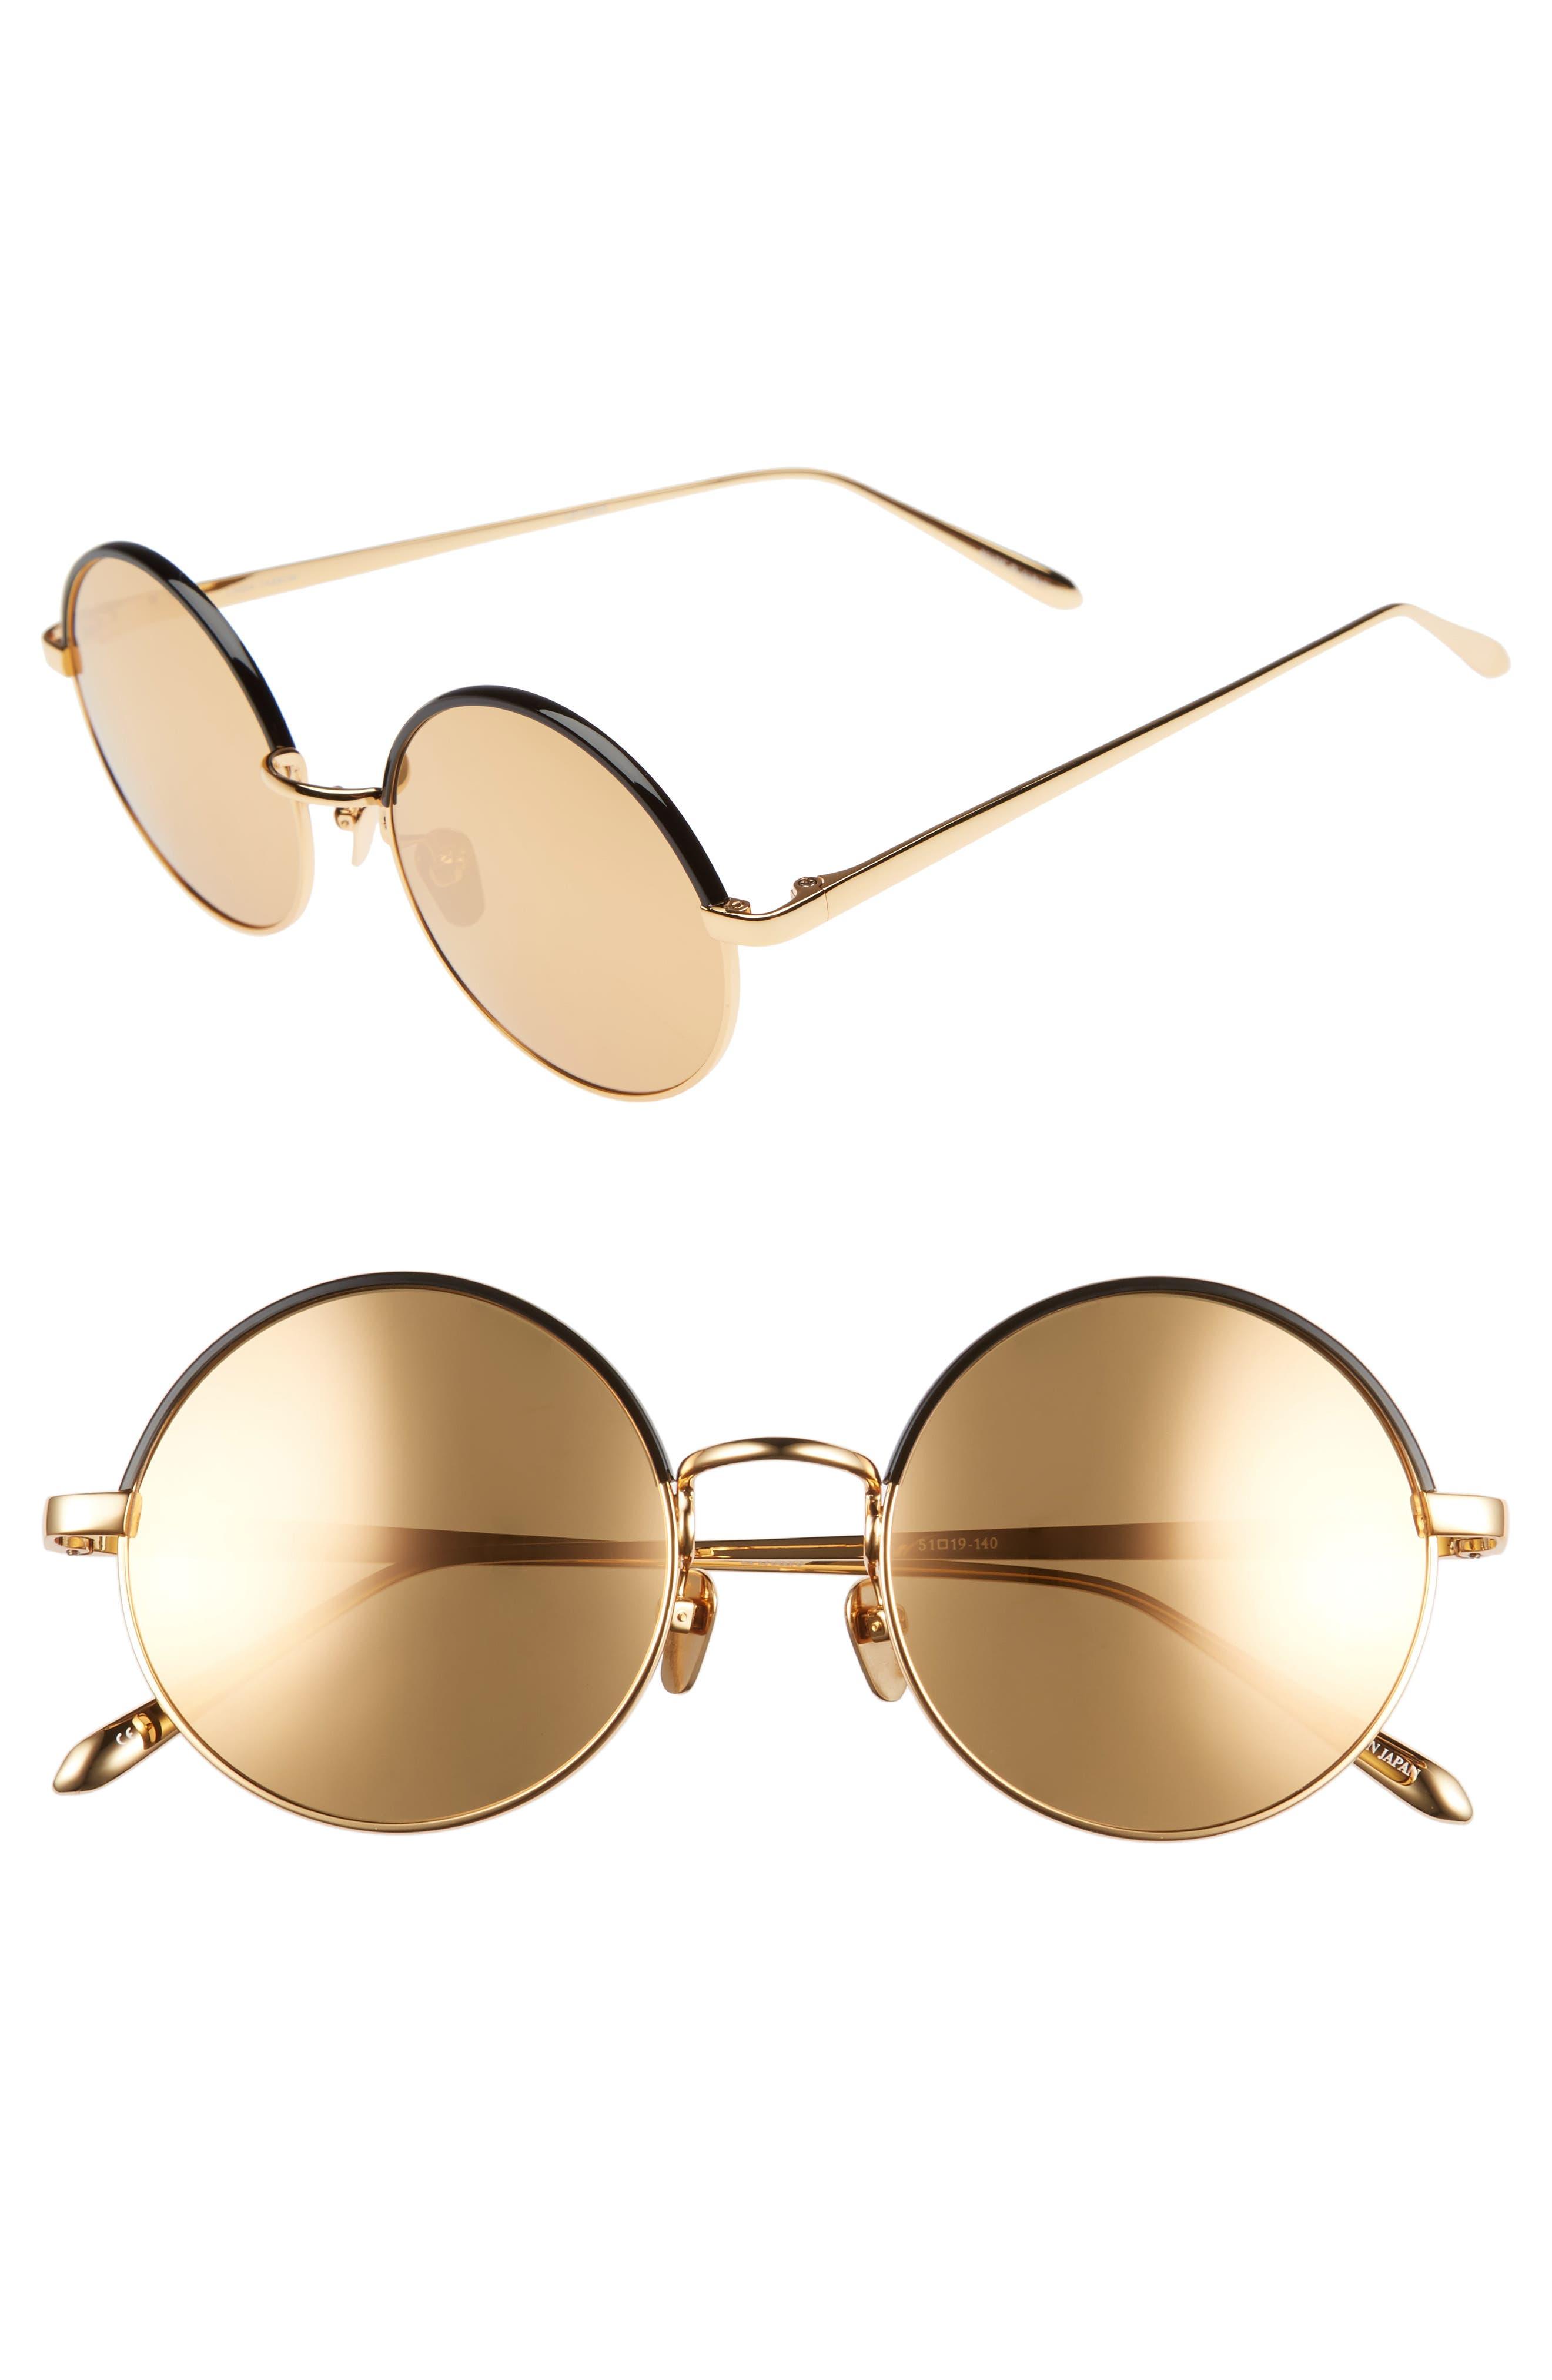 51mm Mirrored 18 Karat Gold Trim Round Sunglasses,                         Main,                         color, 710